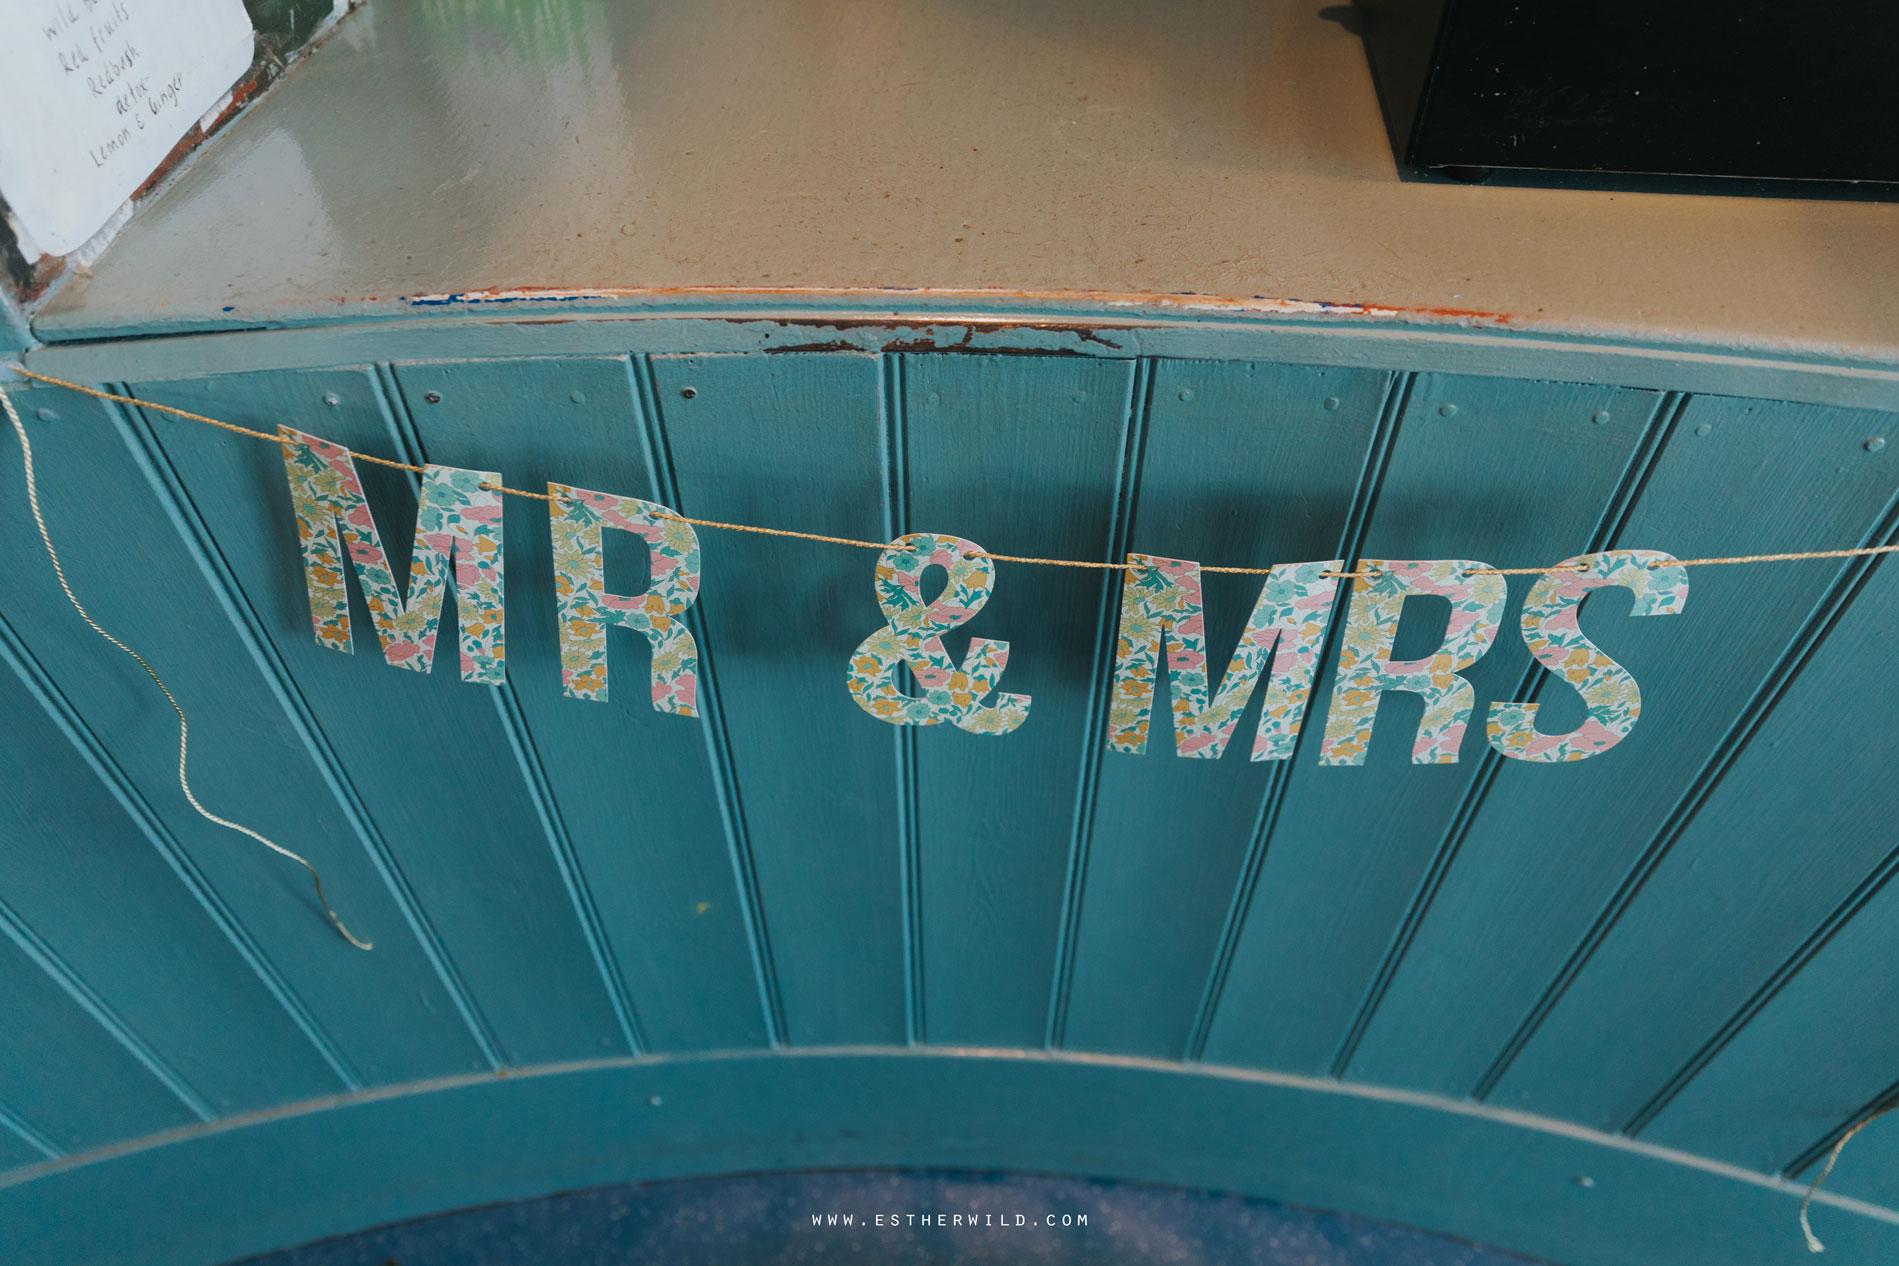 Cromer_Wedding_Beach_Outdoor_Ceremony_Norfolk_North_Lodge_Registry_Office_Rocket_House_Cafe_Cromer_Pier_IMG_4925.jpg